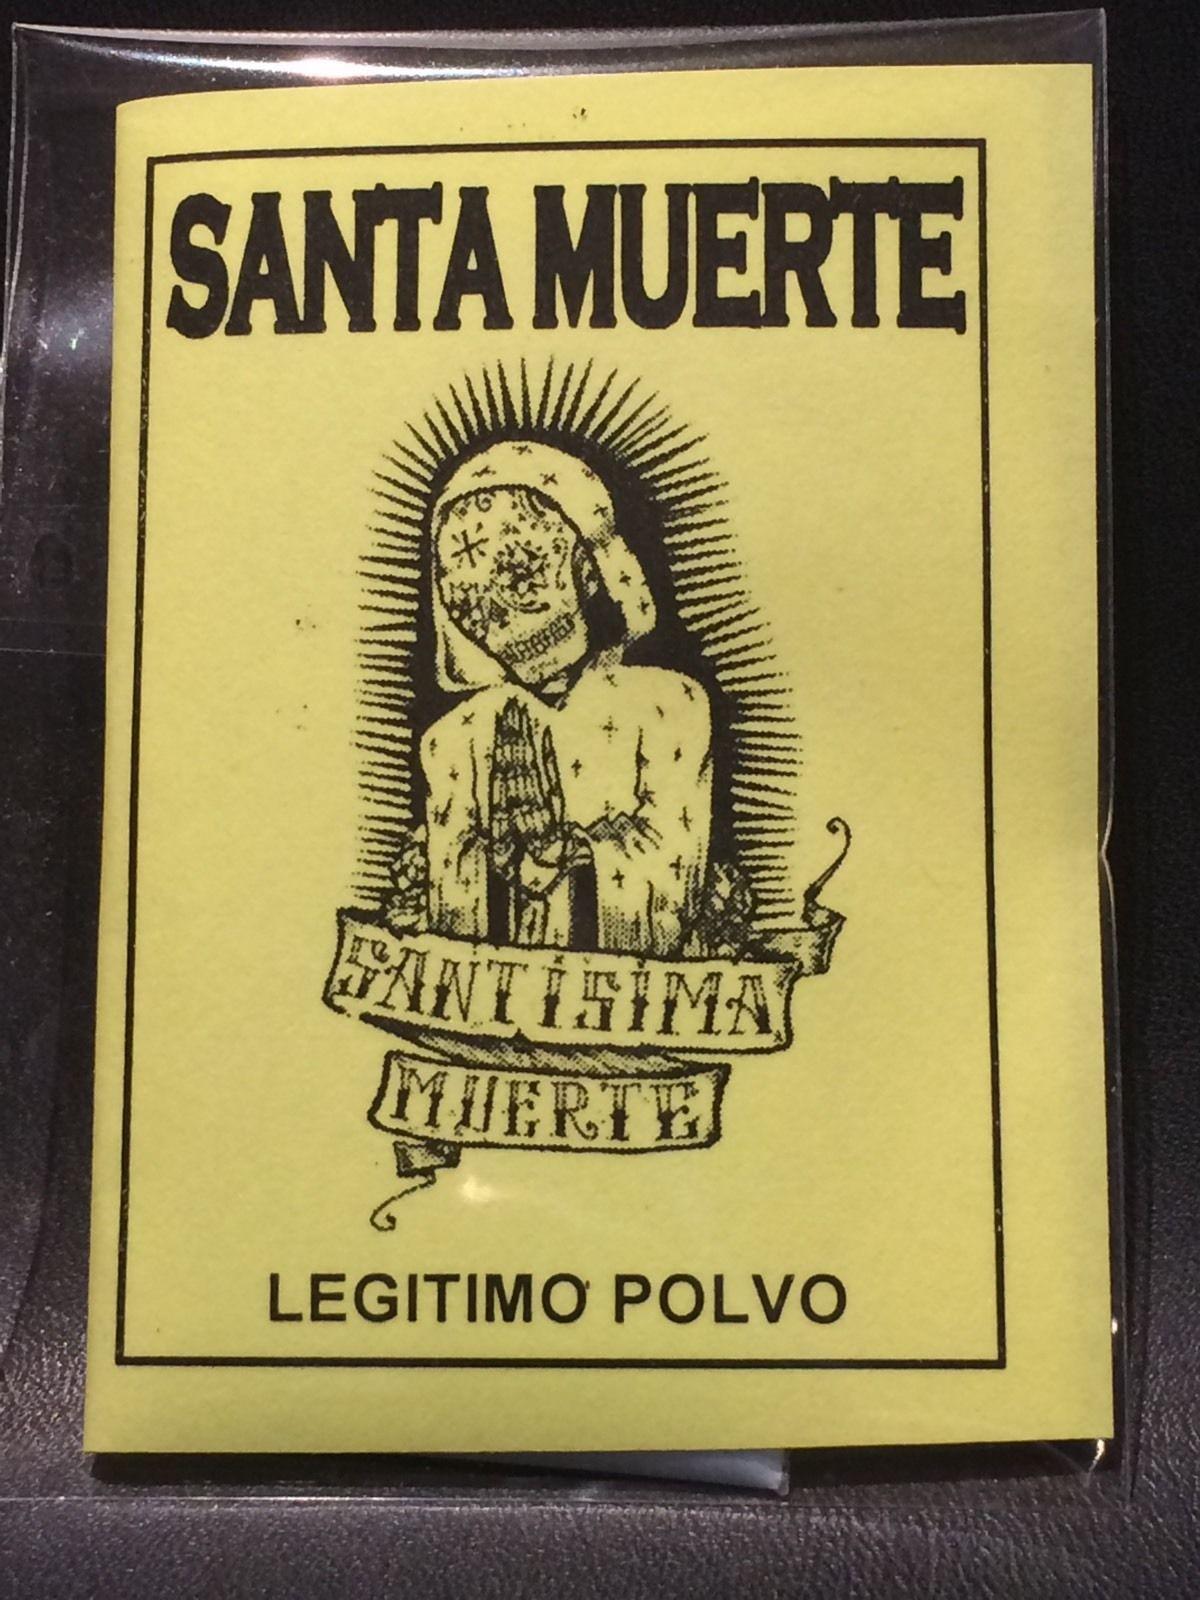 "LEGITIMO POLVO ESOTERICO ESPECIAL "" SANTA MUERTE """